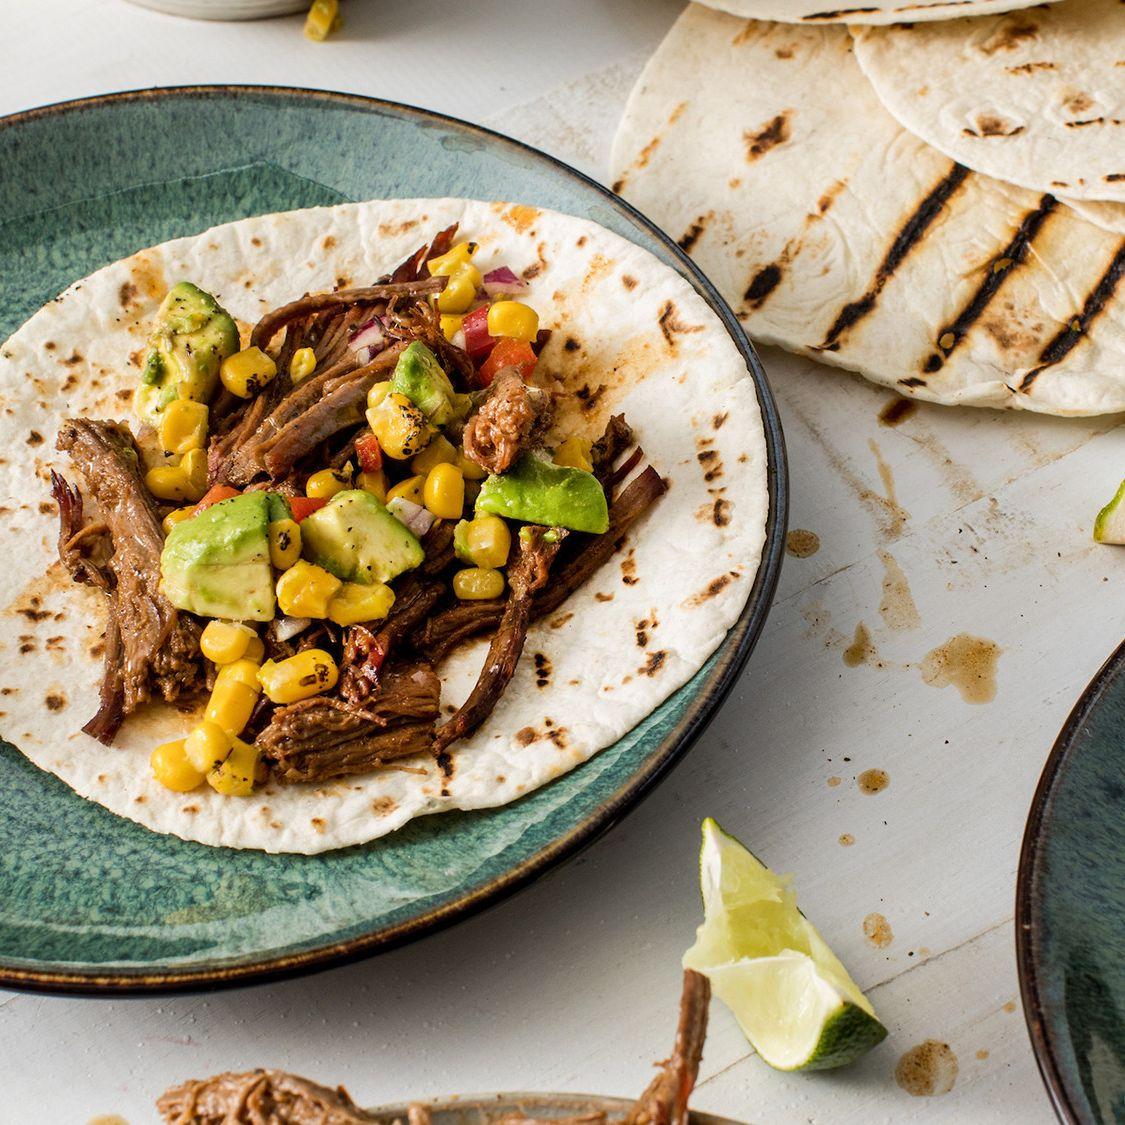 brisket_tacos_with_roasted_corn_avocado_salsa.jpg